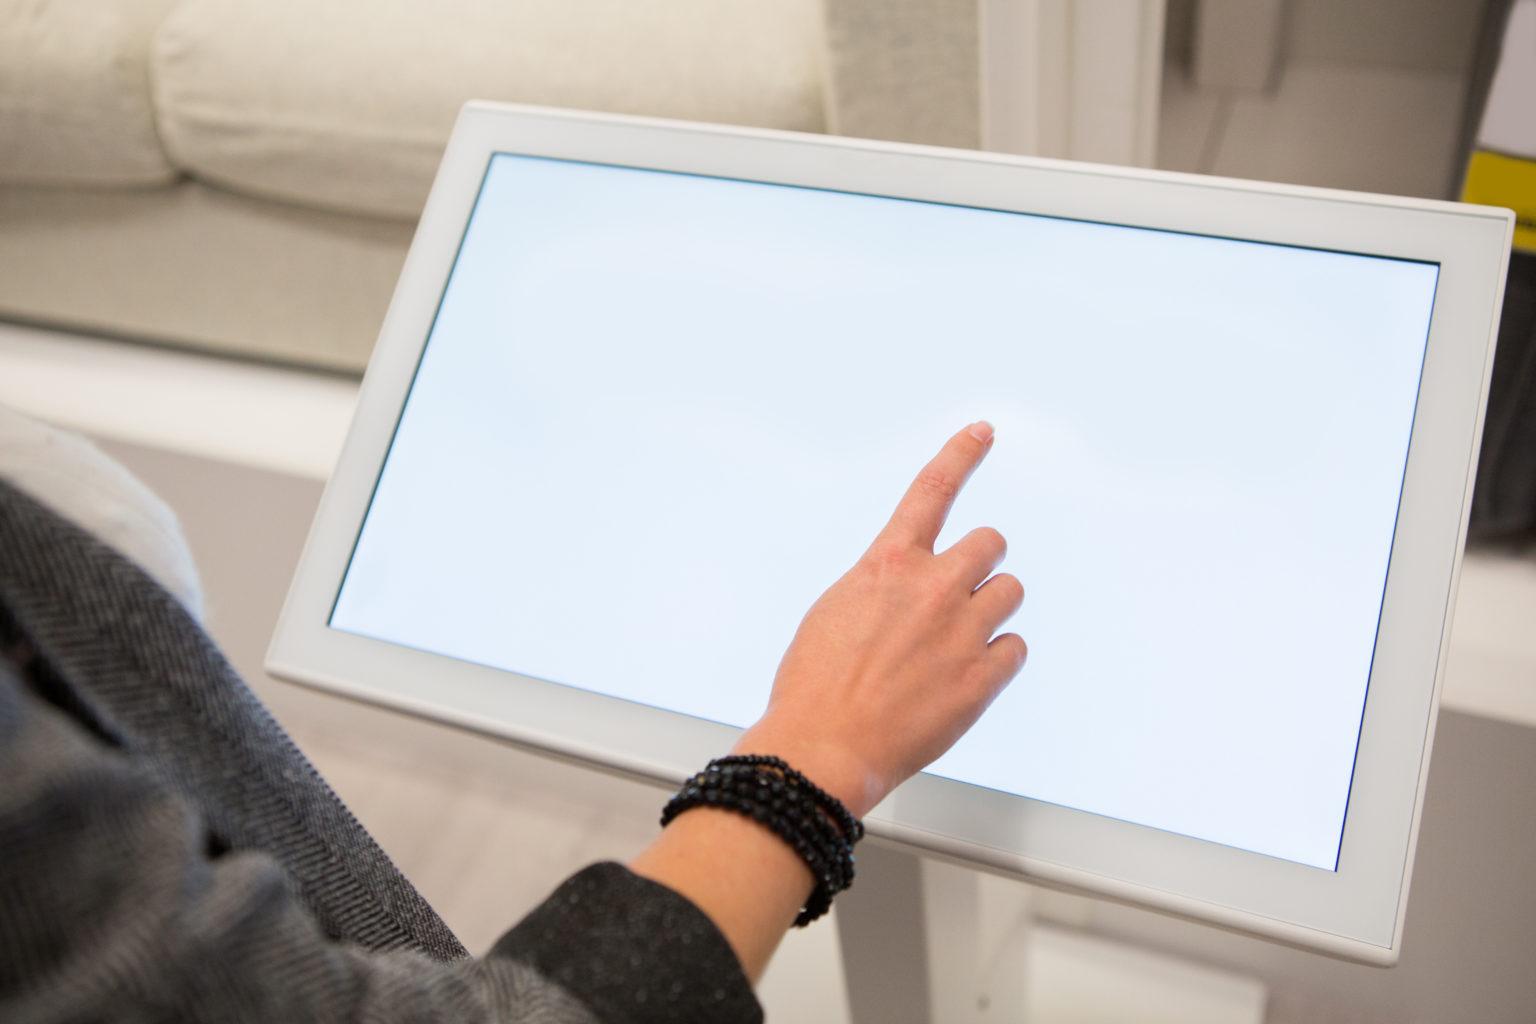 Terabee Sensors Modules How Gesture Control Mitigates Hygiene Hazards for Smart Buildings, Kiosks & Information Panels